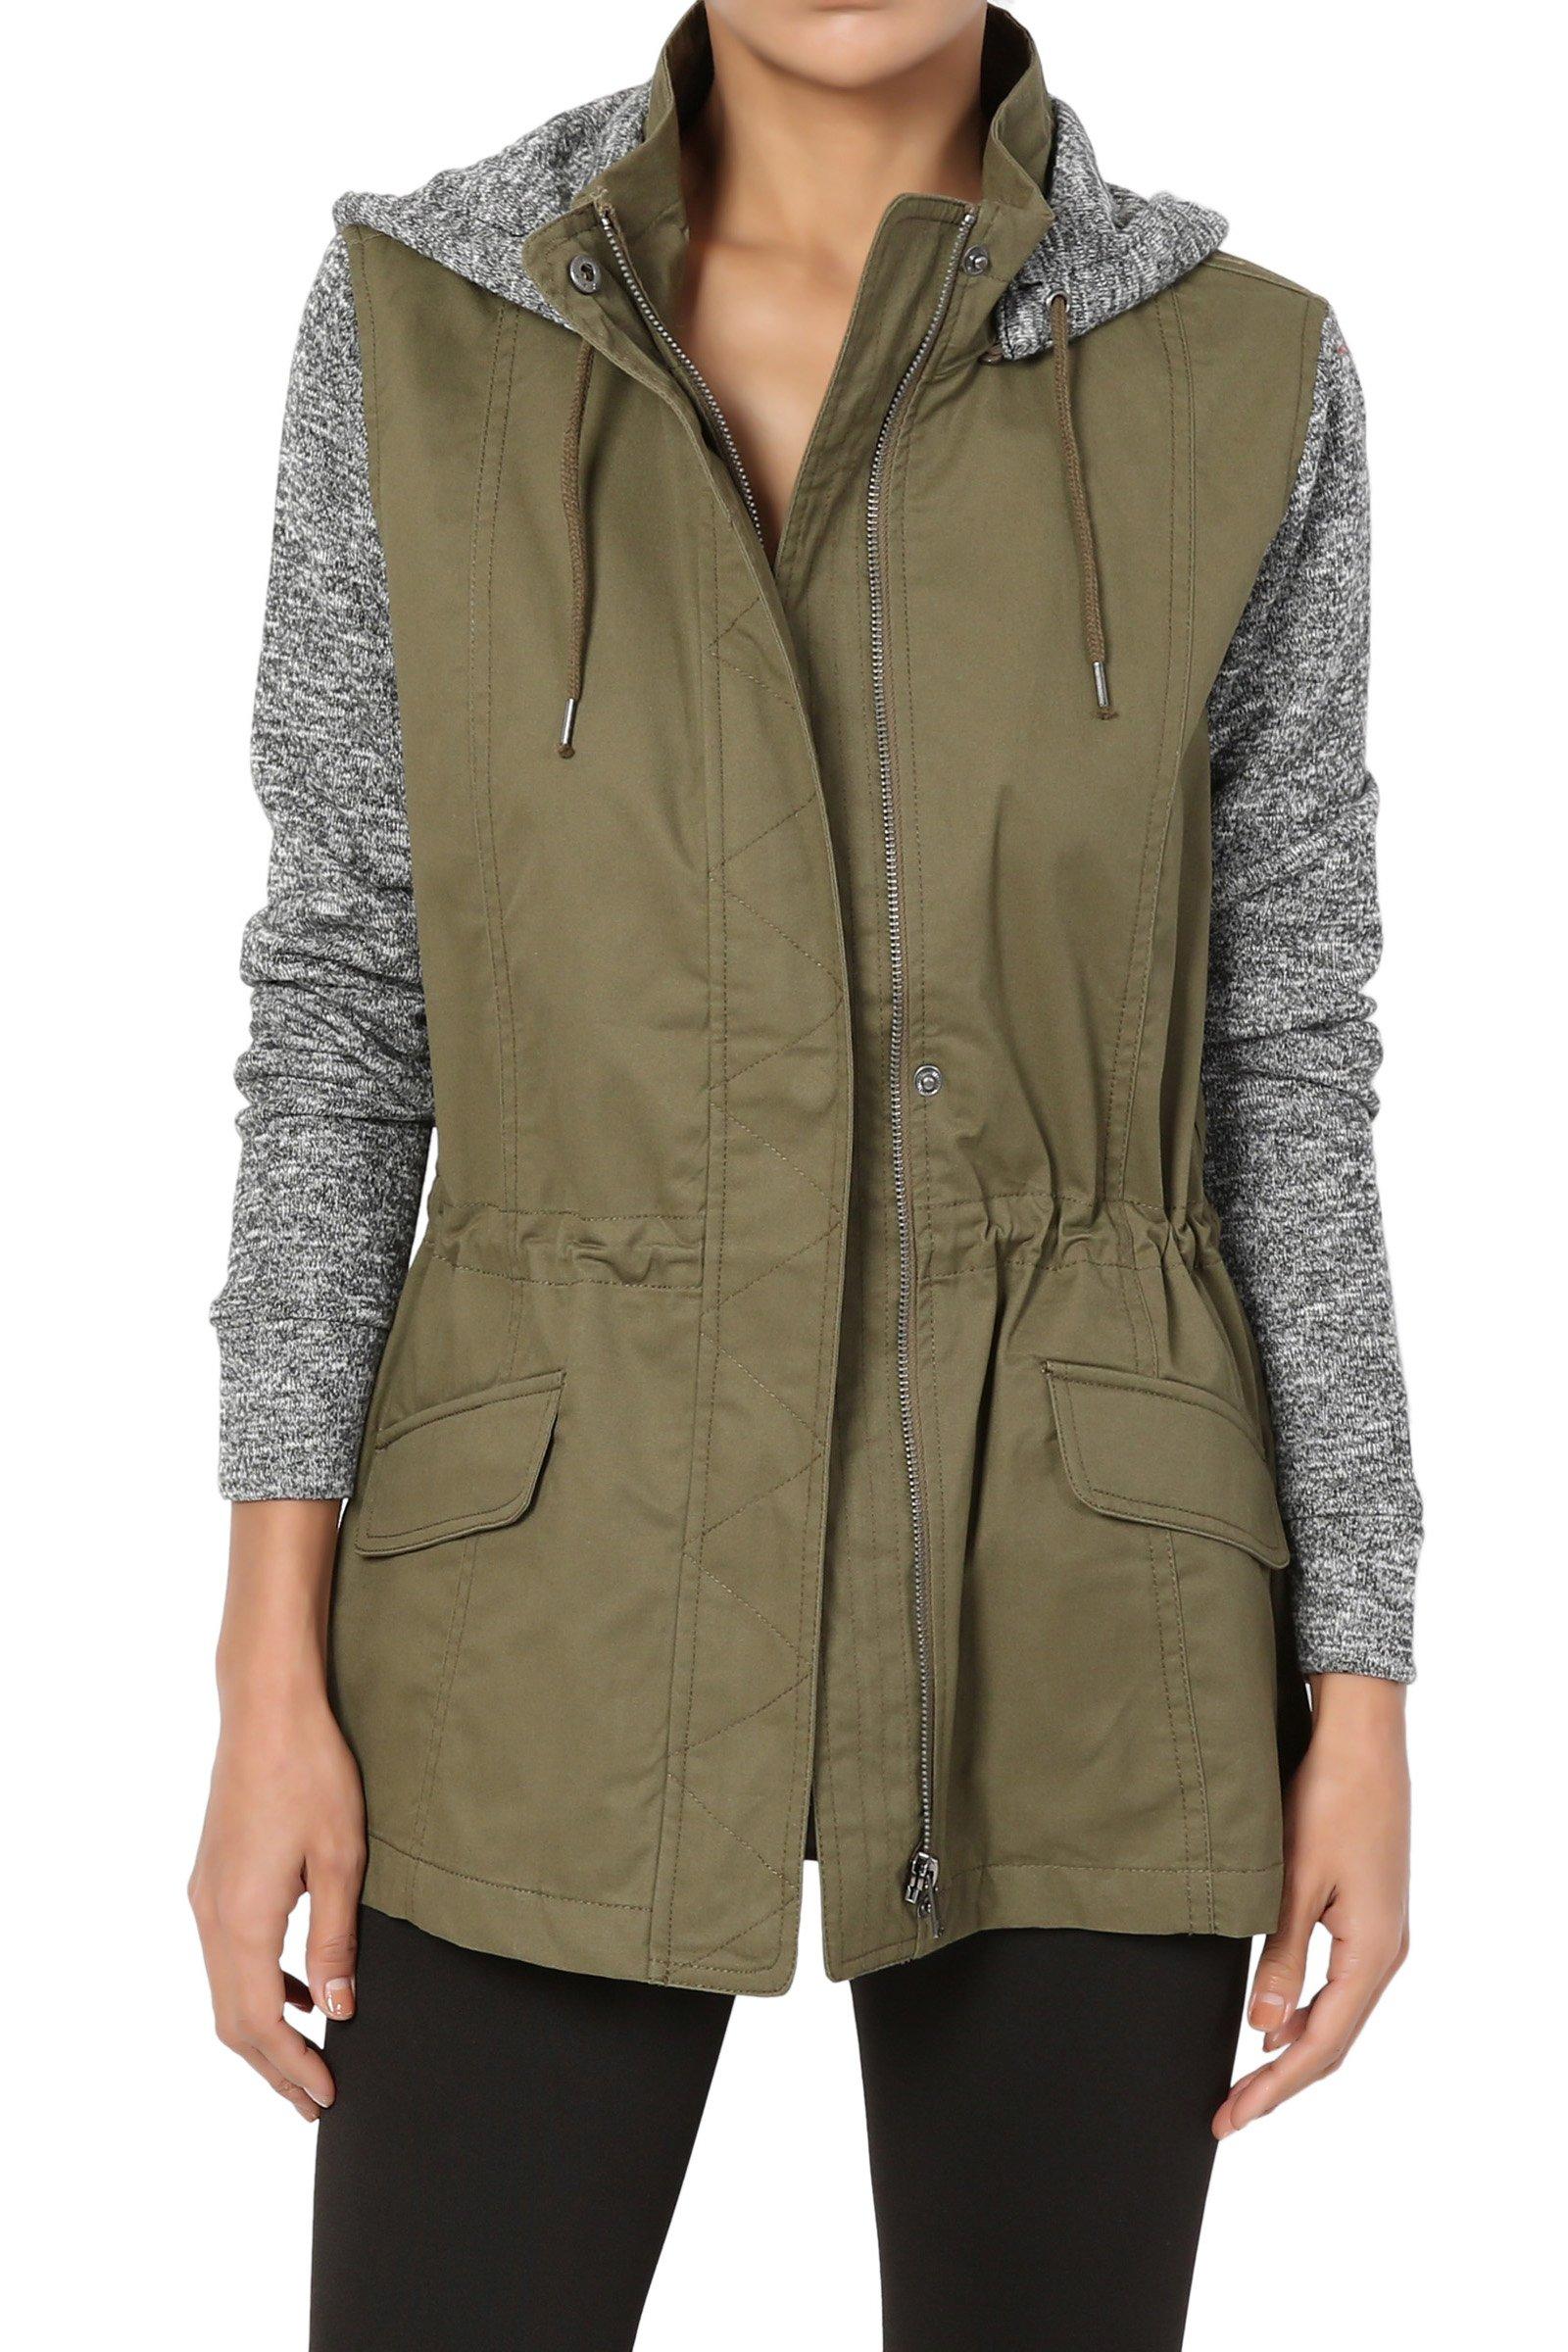 664ab0da129 TheMogan Junior's Sweater Knit Sleeve & Hooded Utility Anorak Jacket Olive S